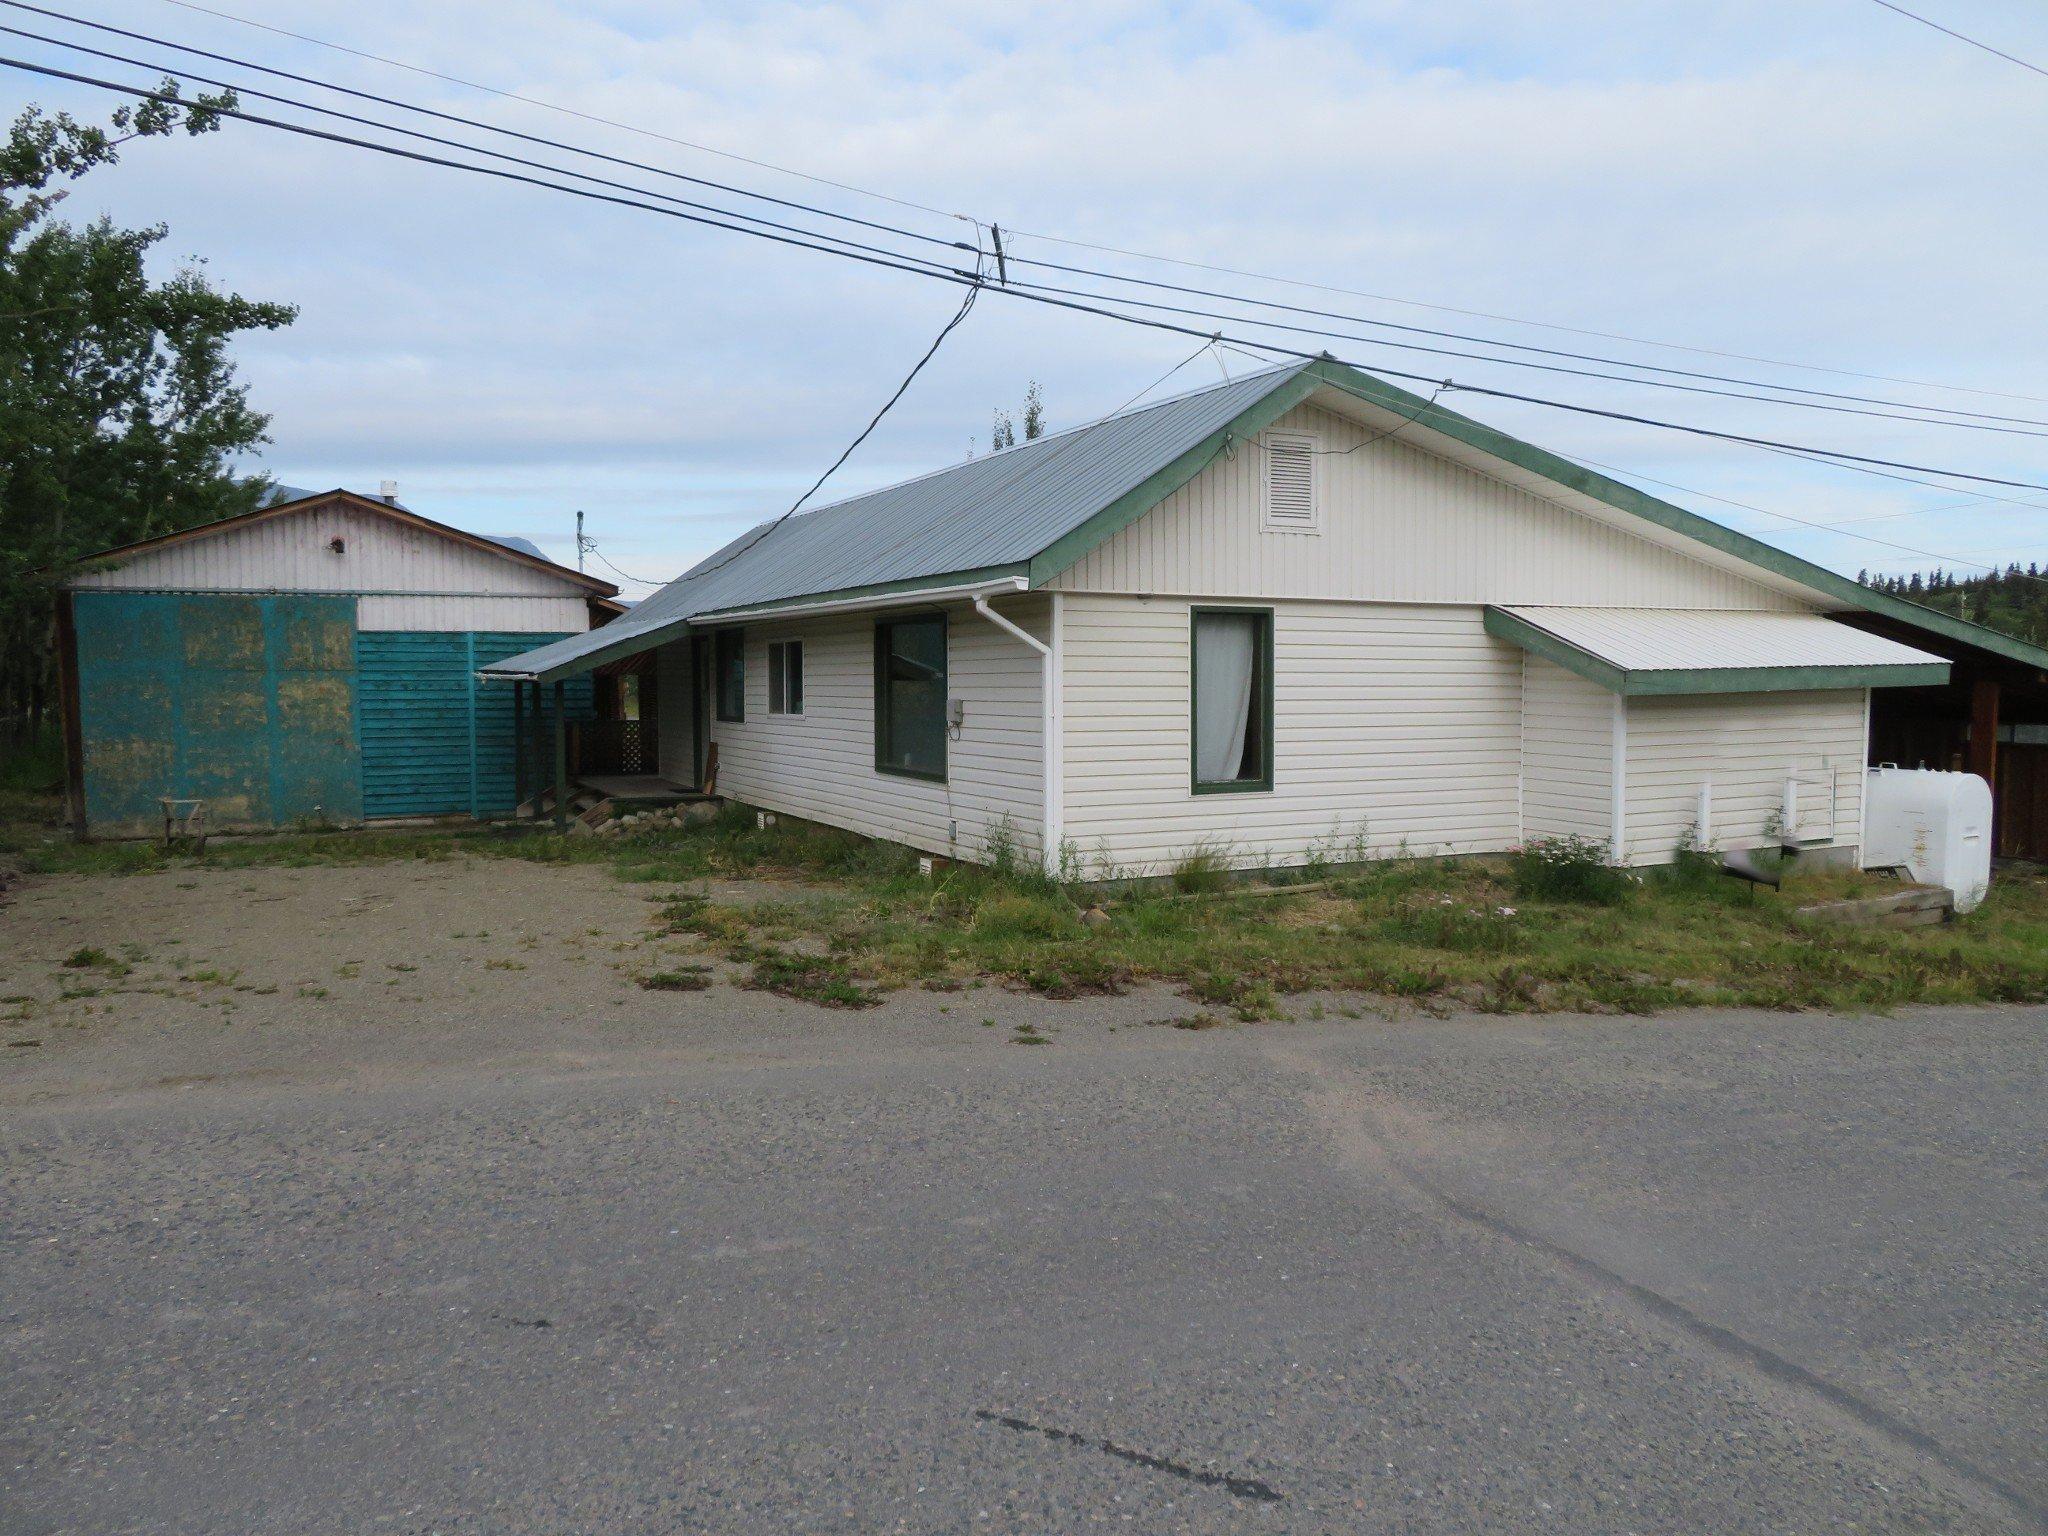 Main Photo: PARCEL A - LOT 12 3RD Street: Atlin House for sale (Terrace (Zone 88))  : MLS®# R2382580